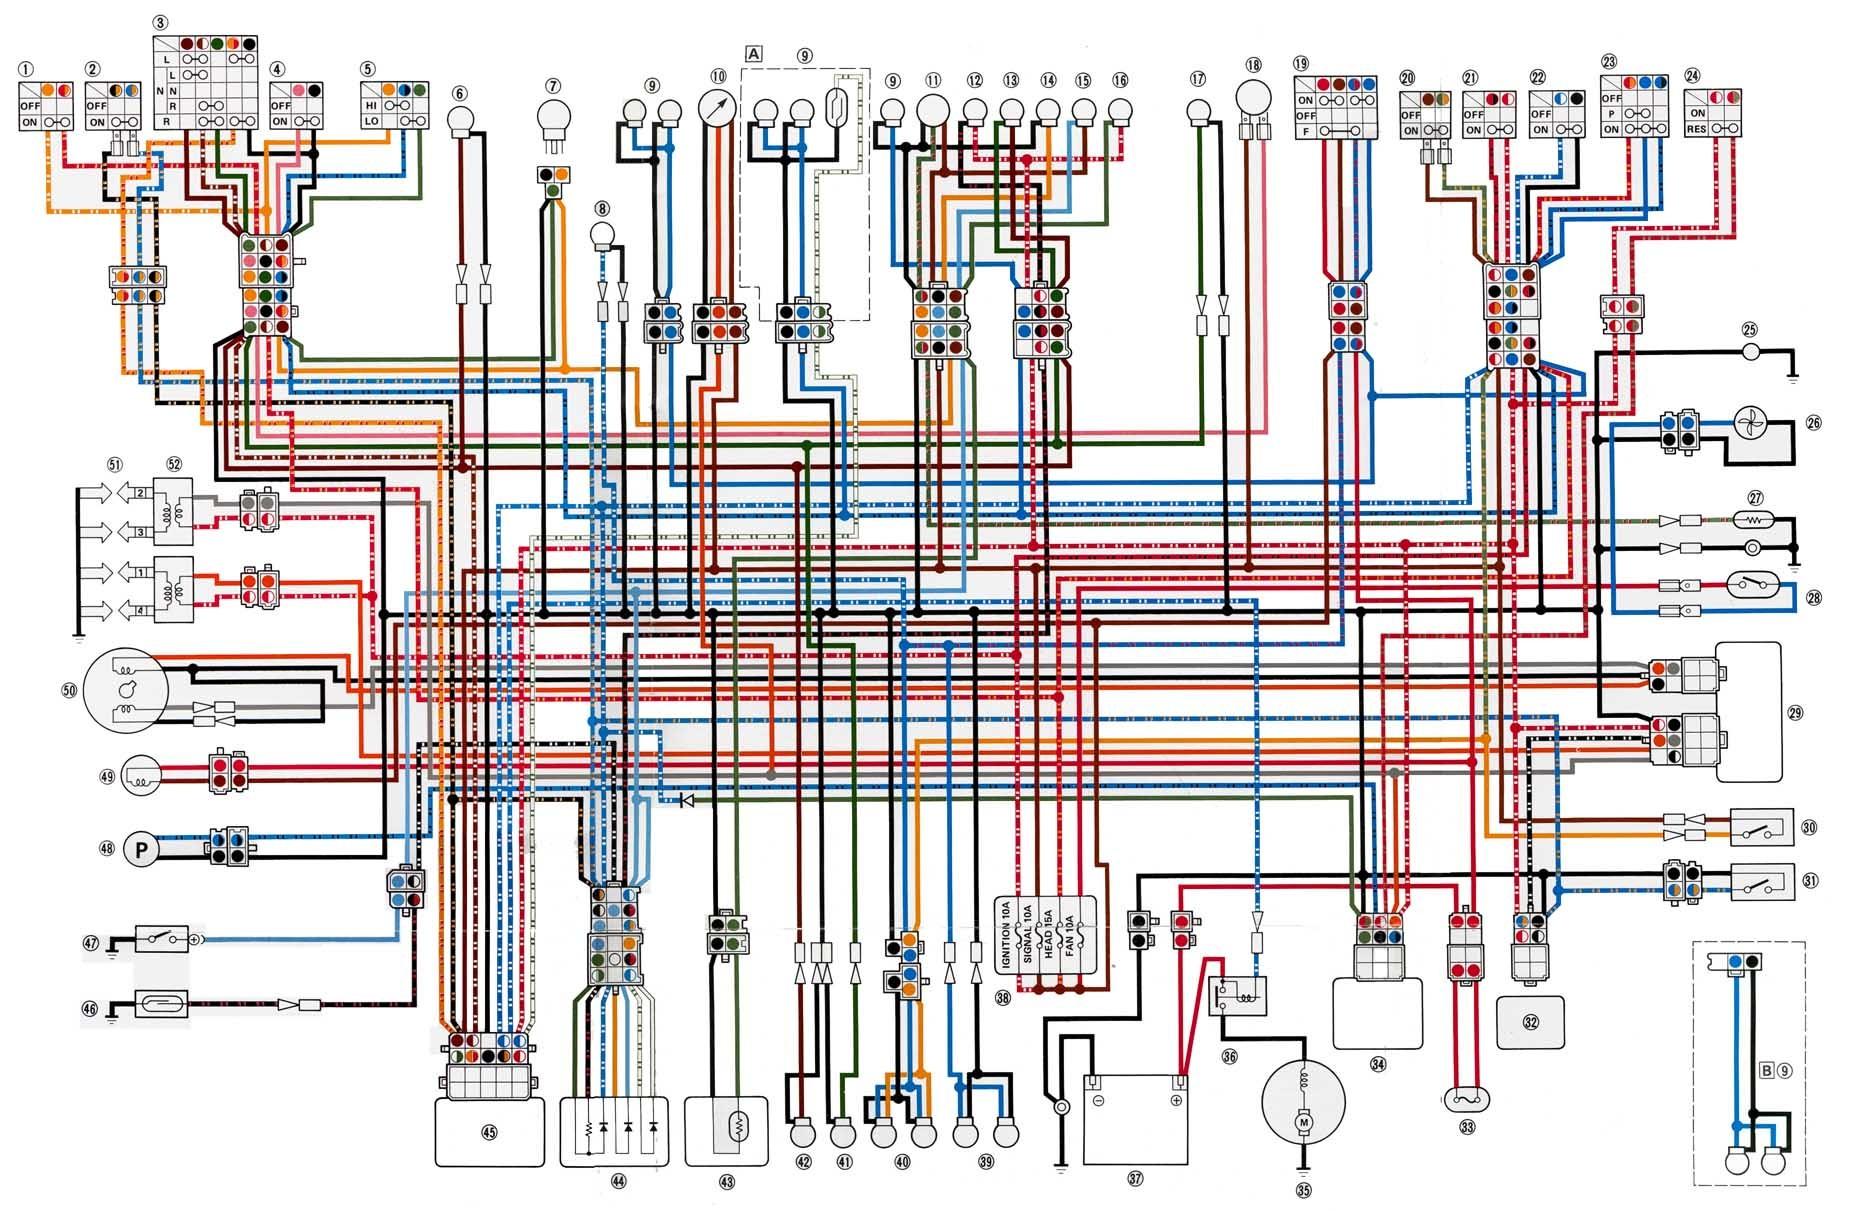 hight resolution of yamaha xj1100 wiring diagram wiring diagrams scematic yamaha seca wiring xj1100 wiring diagram